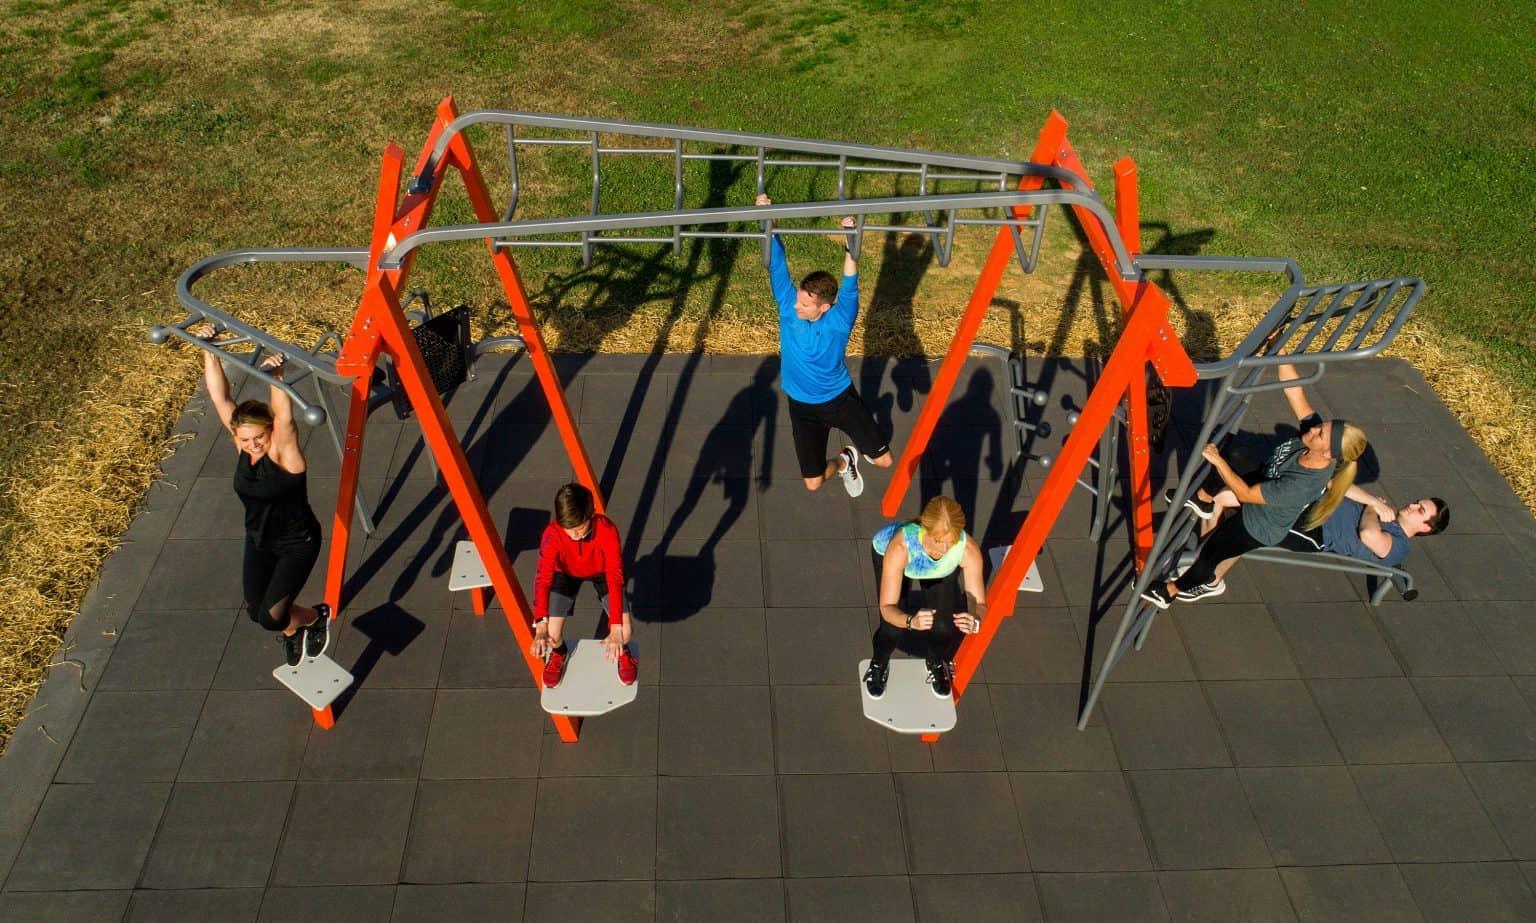 outdoor-fitness-equipment_49643789866_o-1536x923